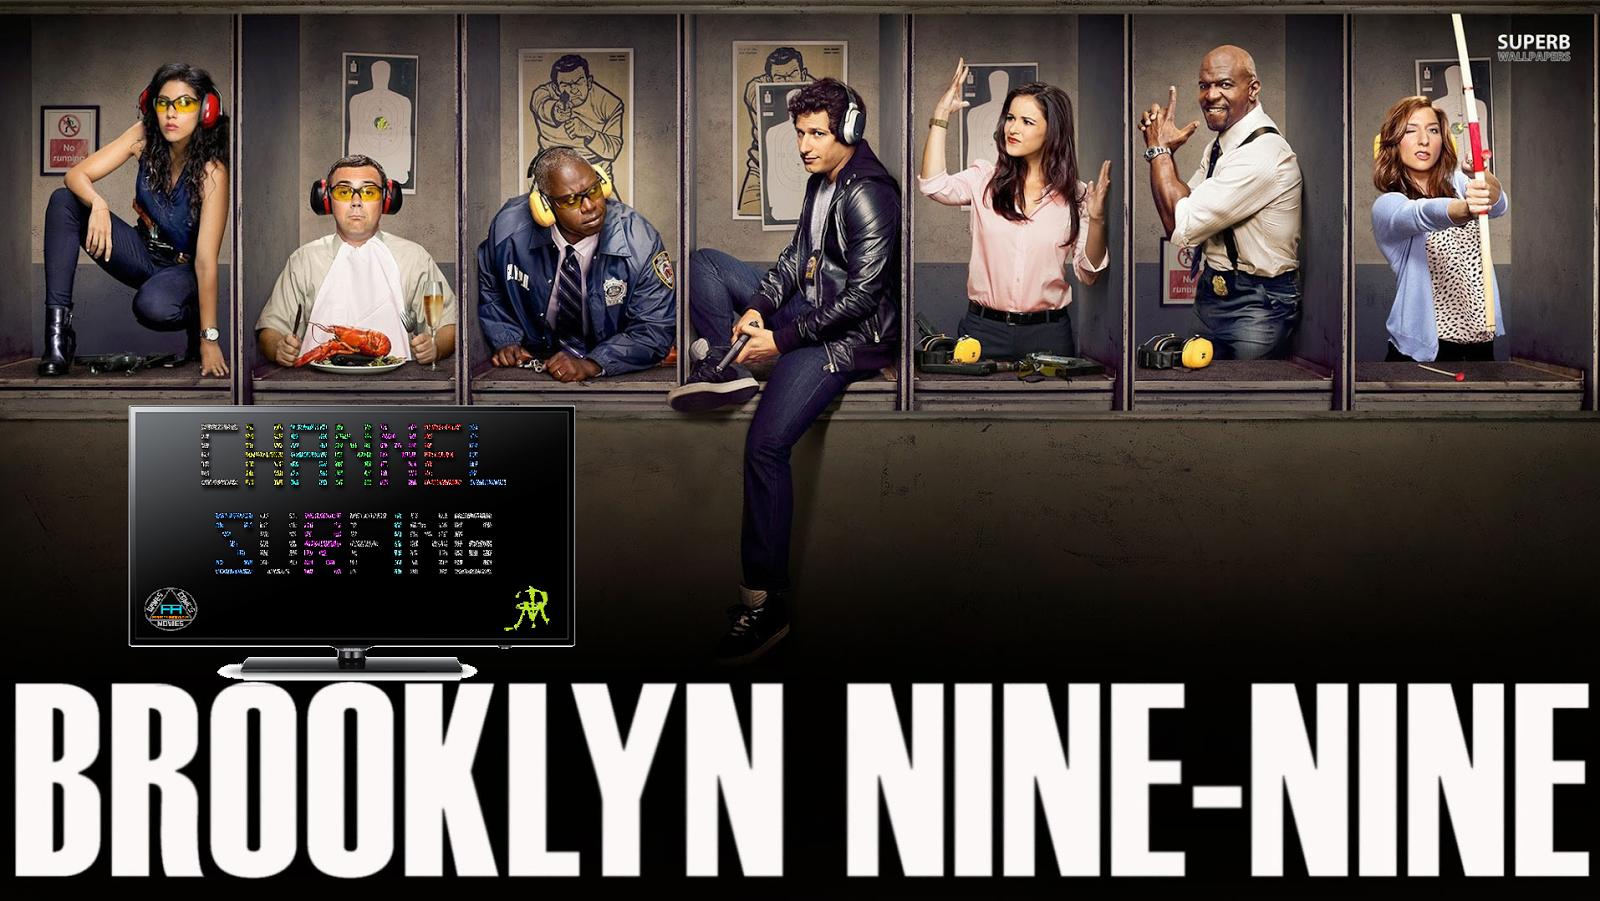 Brooklyn Nine Nine fourth episode free online